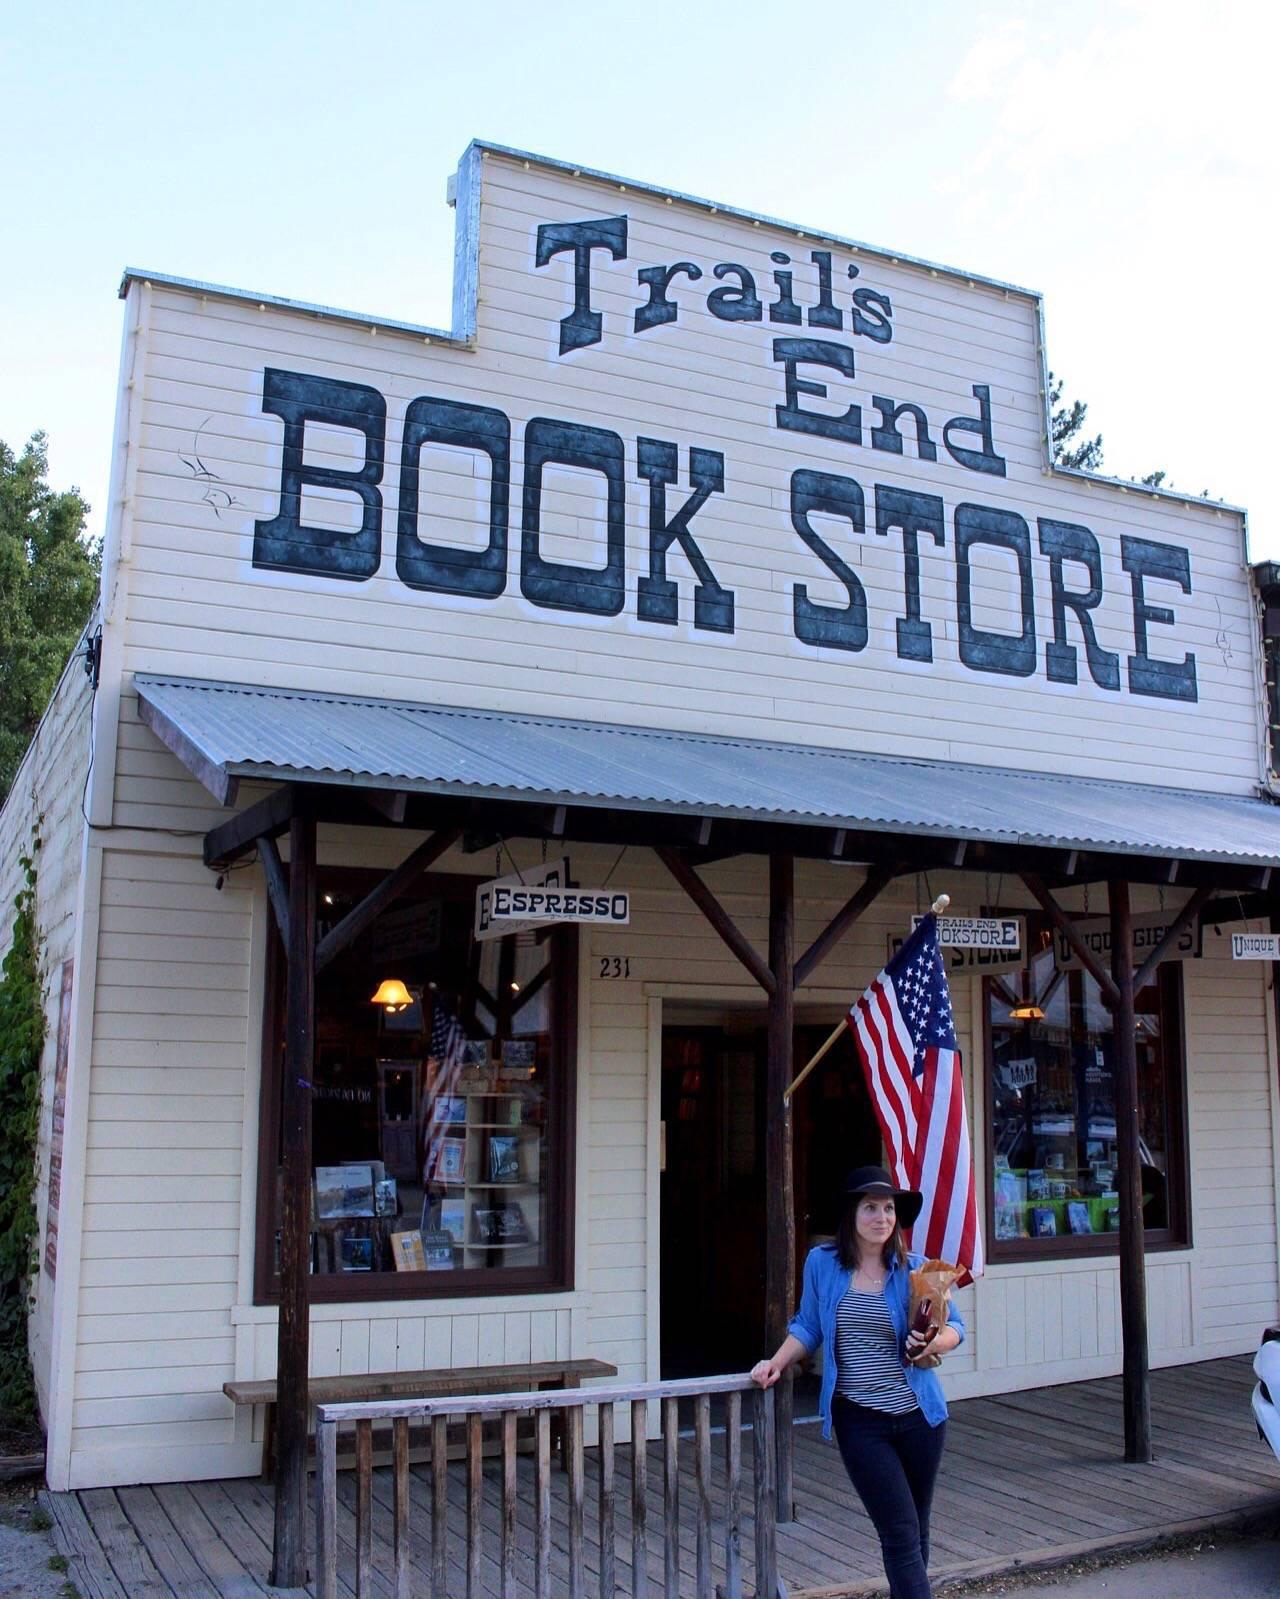 Trail's End Bookstore in Winthrop WA